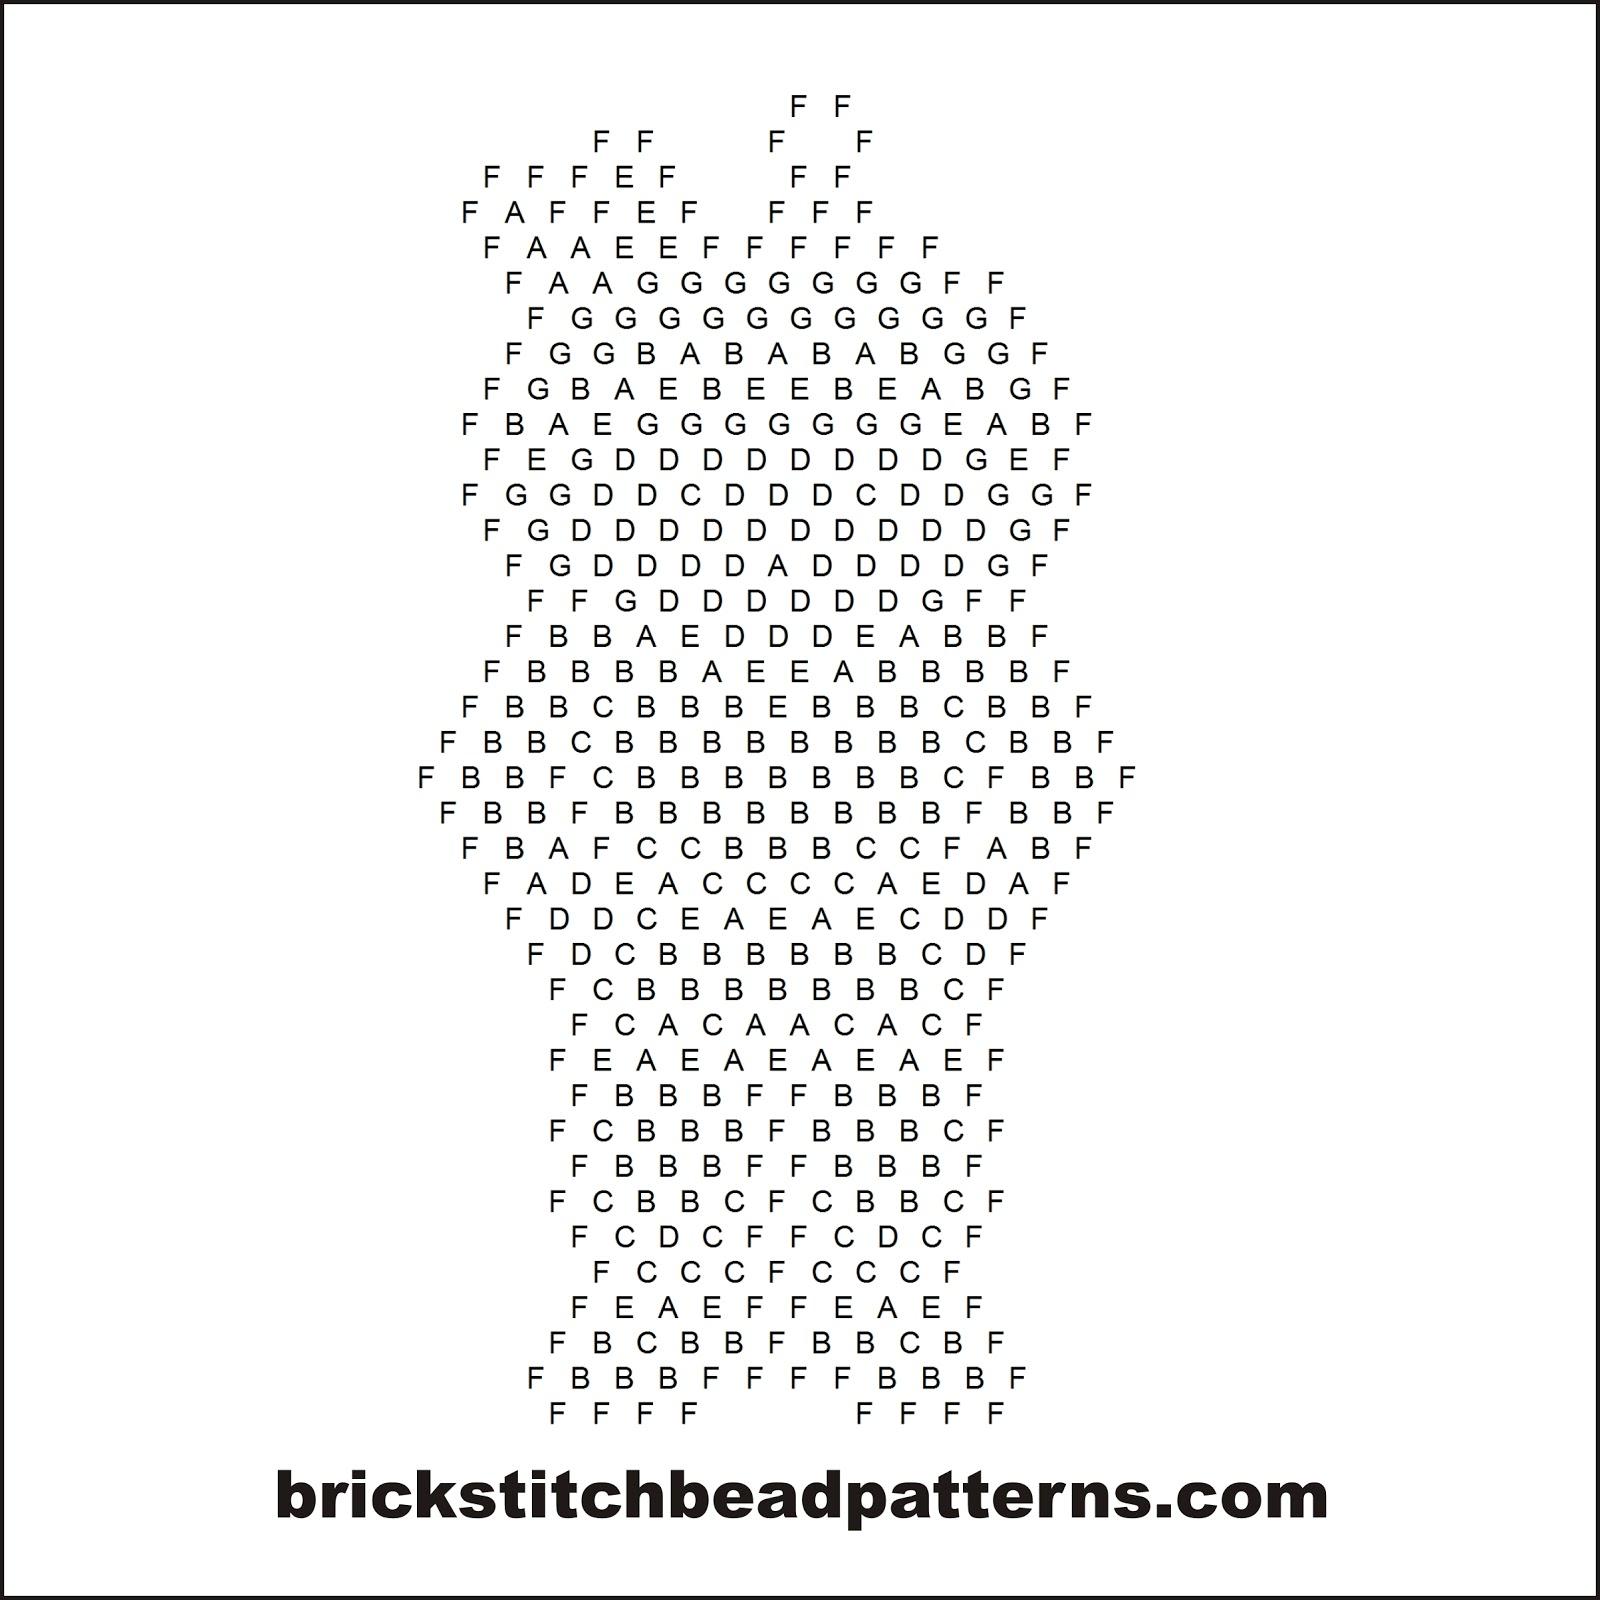 Brick Stitch Bead Patterns Journal: Little Native American